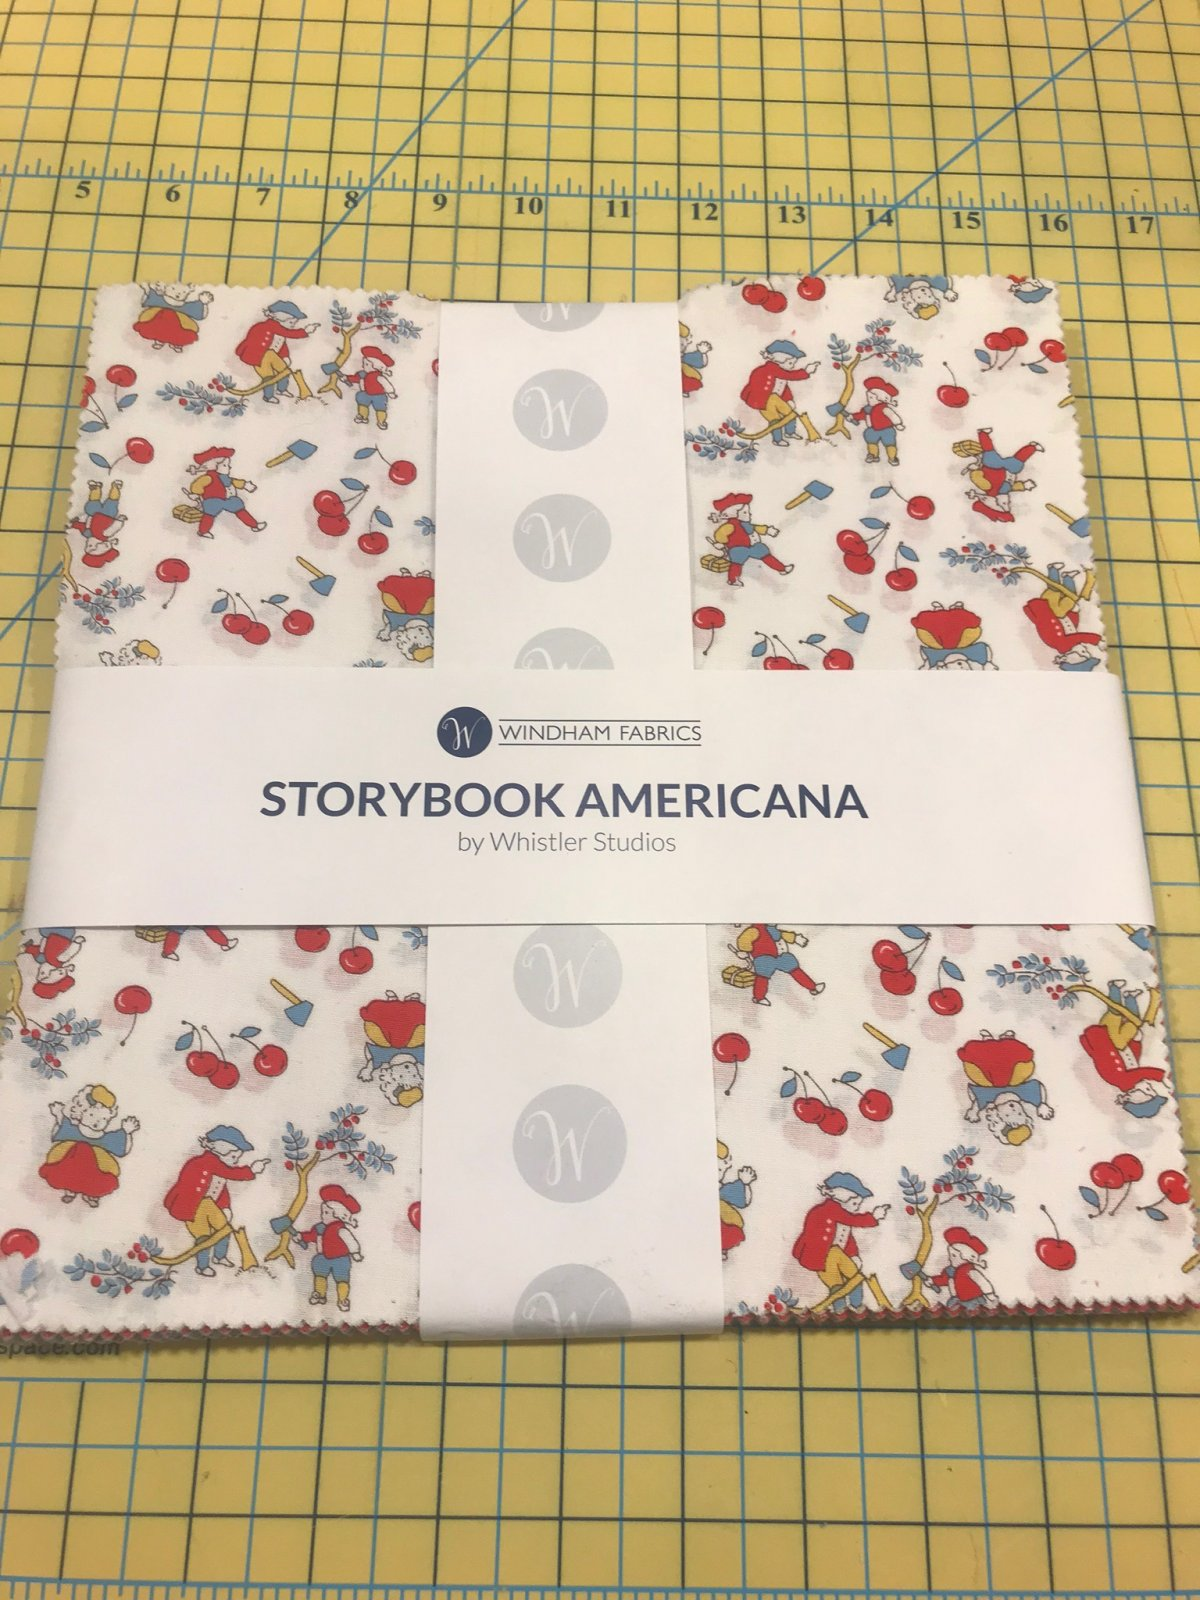 10 squares Storybook Americana by Windham Fabrics